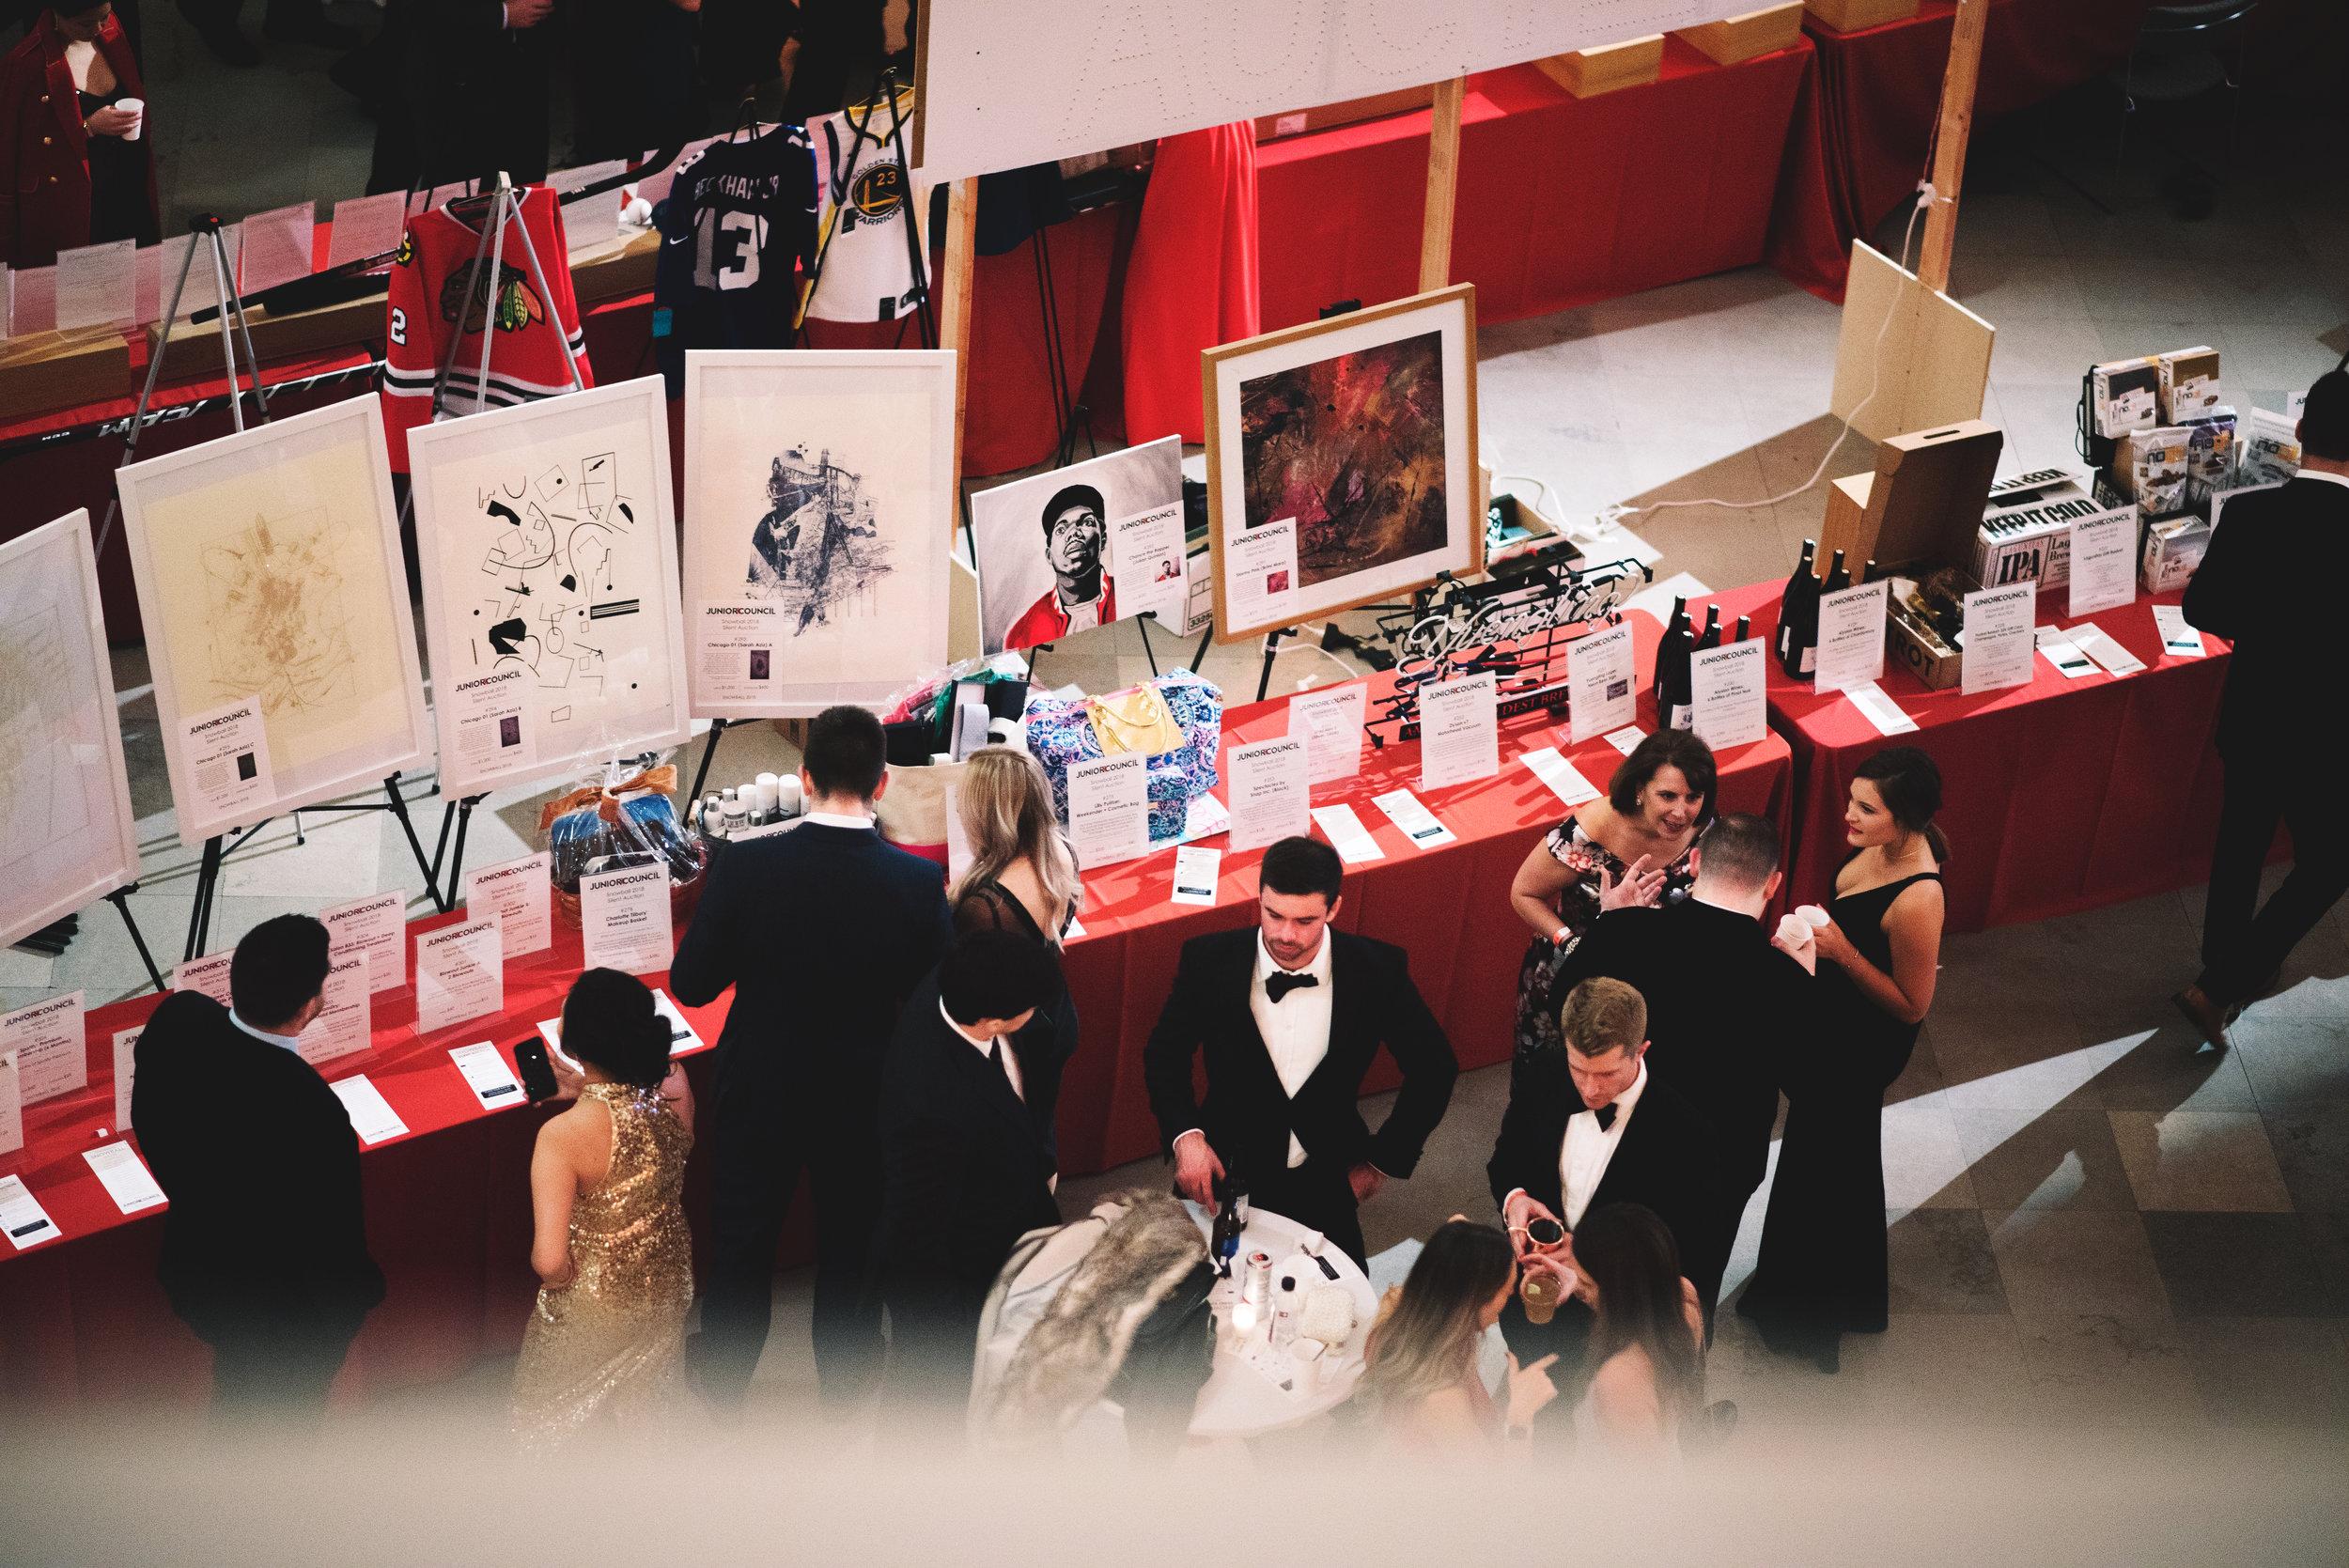 SnowBall-FieldMuseum-Chicago-Fundraiser018.jpg